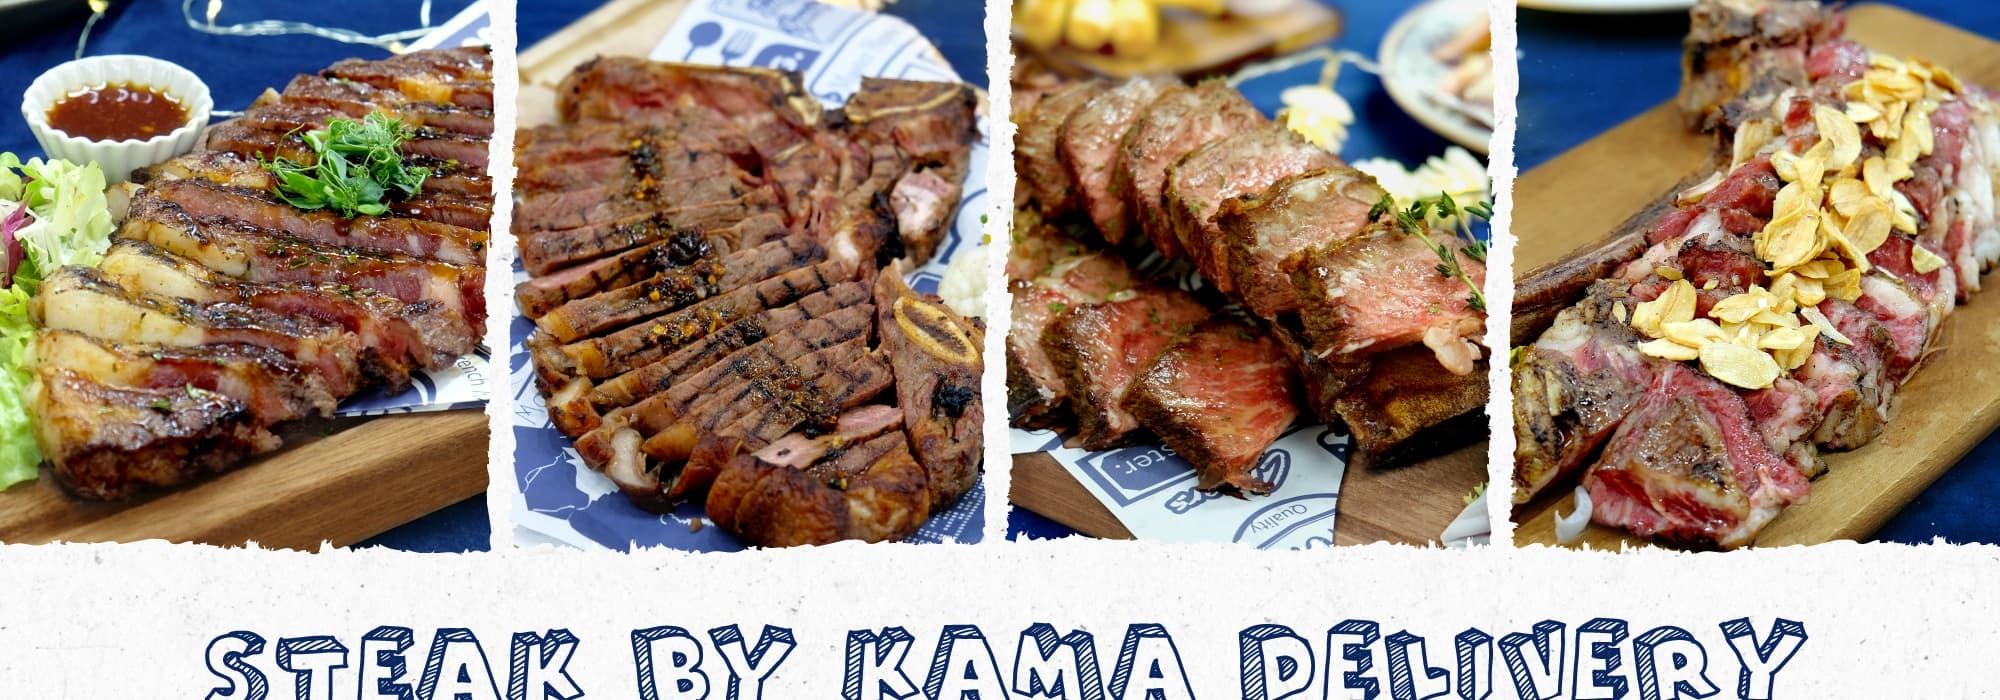 食肉獸福音【4款高質牛扒外賣必食推薦】|Kama Delivery到會服務專家